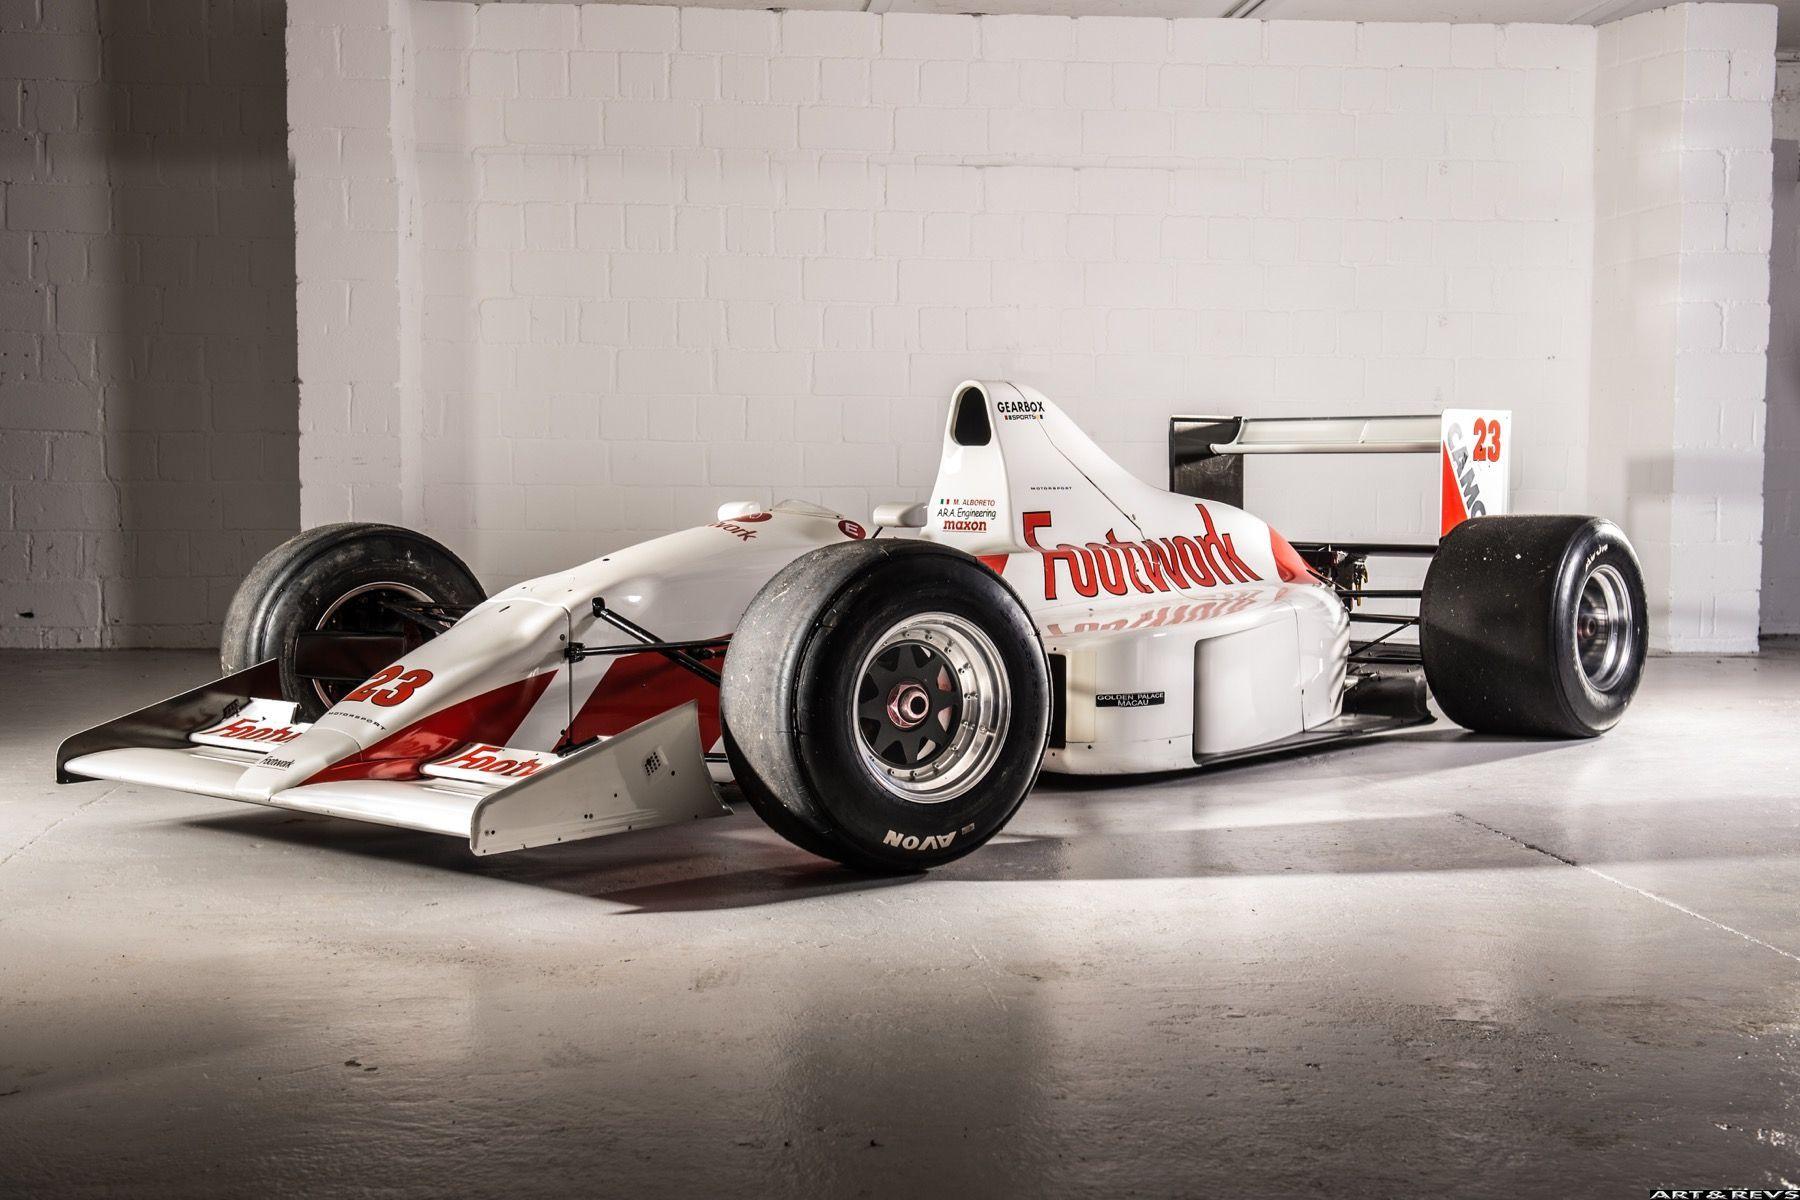 ARROWS - PORSCHE A11C   Formula 1 car, Racing, Vintage ...